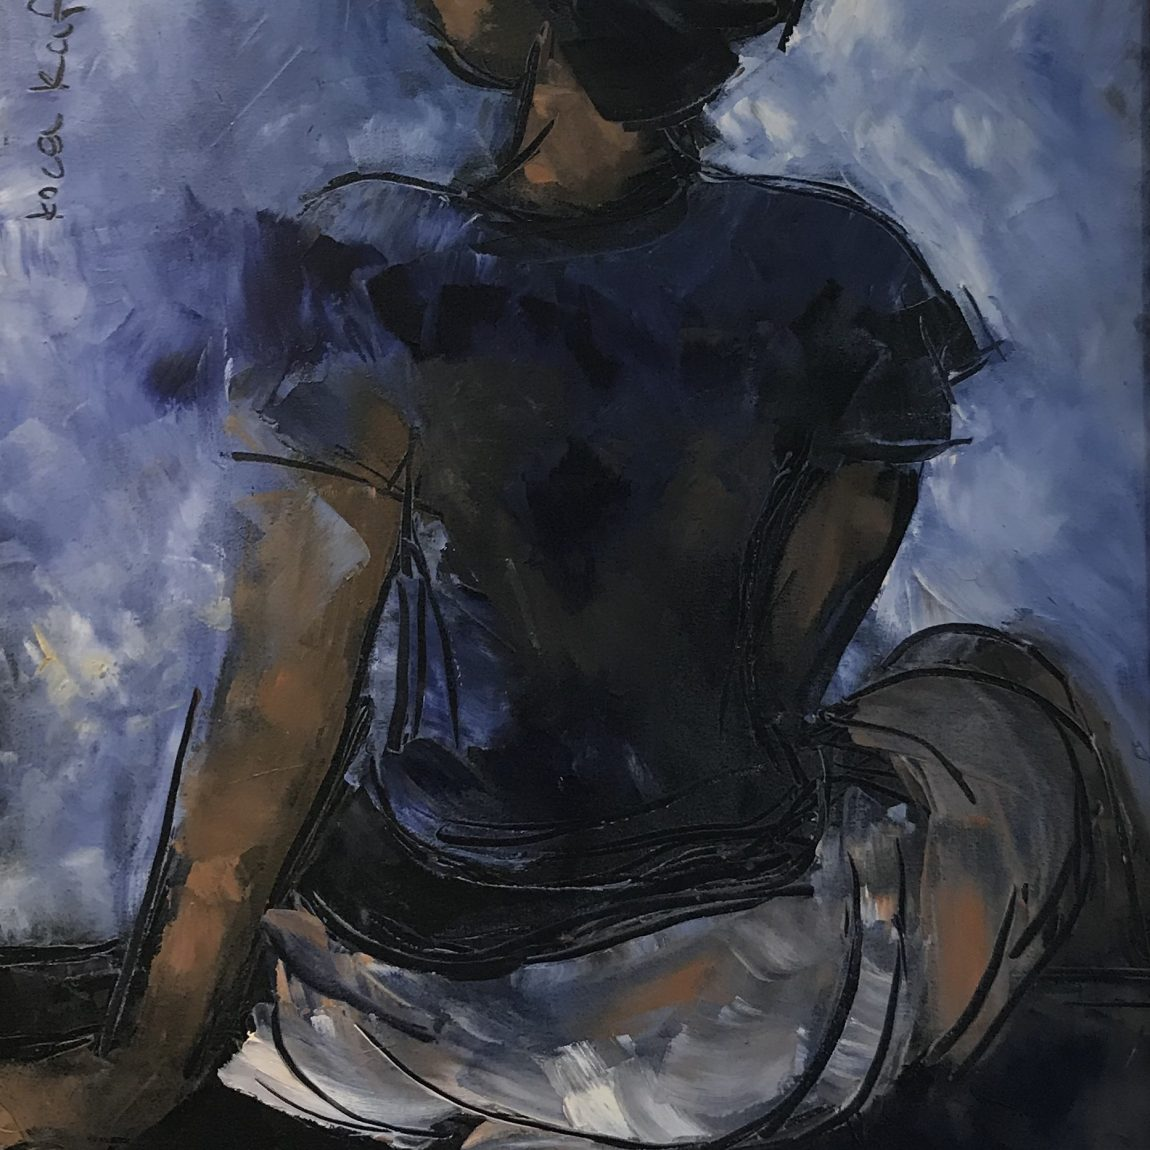 Nihal Şenlier- Teknik: Tuval Üzeri Yağlı Boya Ölçü: 65 x 83 - Fiyat : 8.260 TL